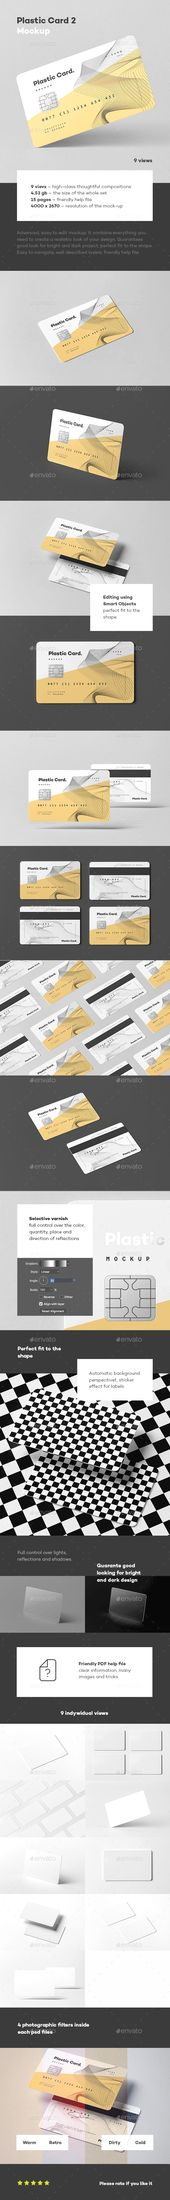 Plastic Card Mock-up 2 – Envato Market #mockup #psd #ProductMockup #BusinessCard…